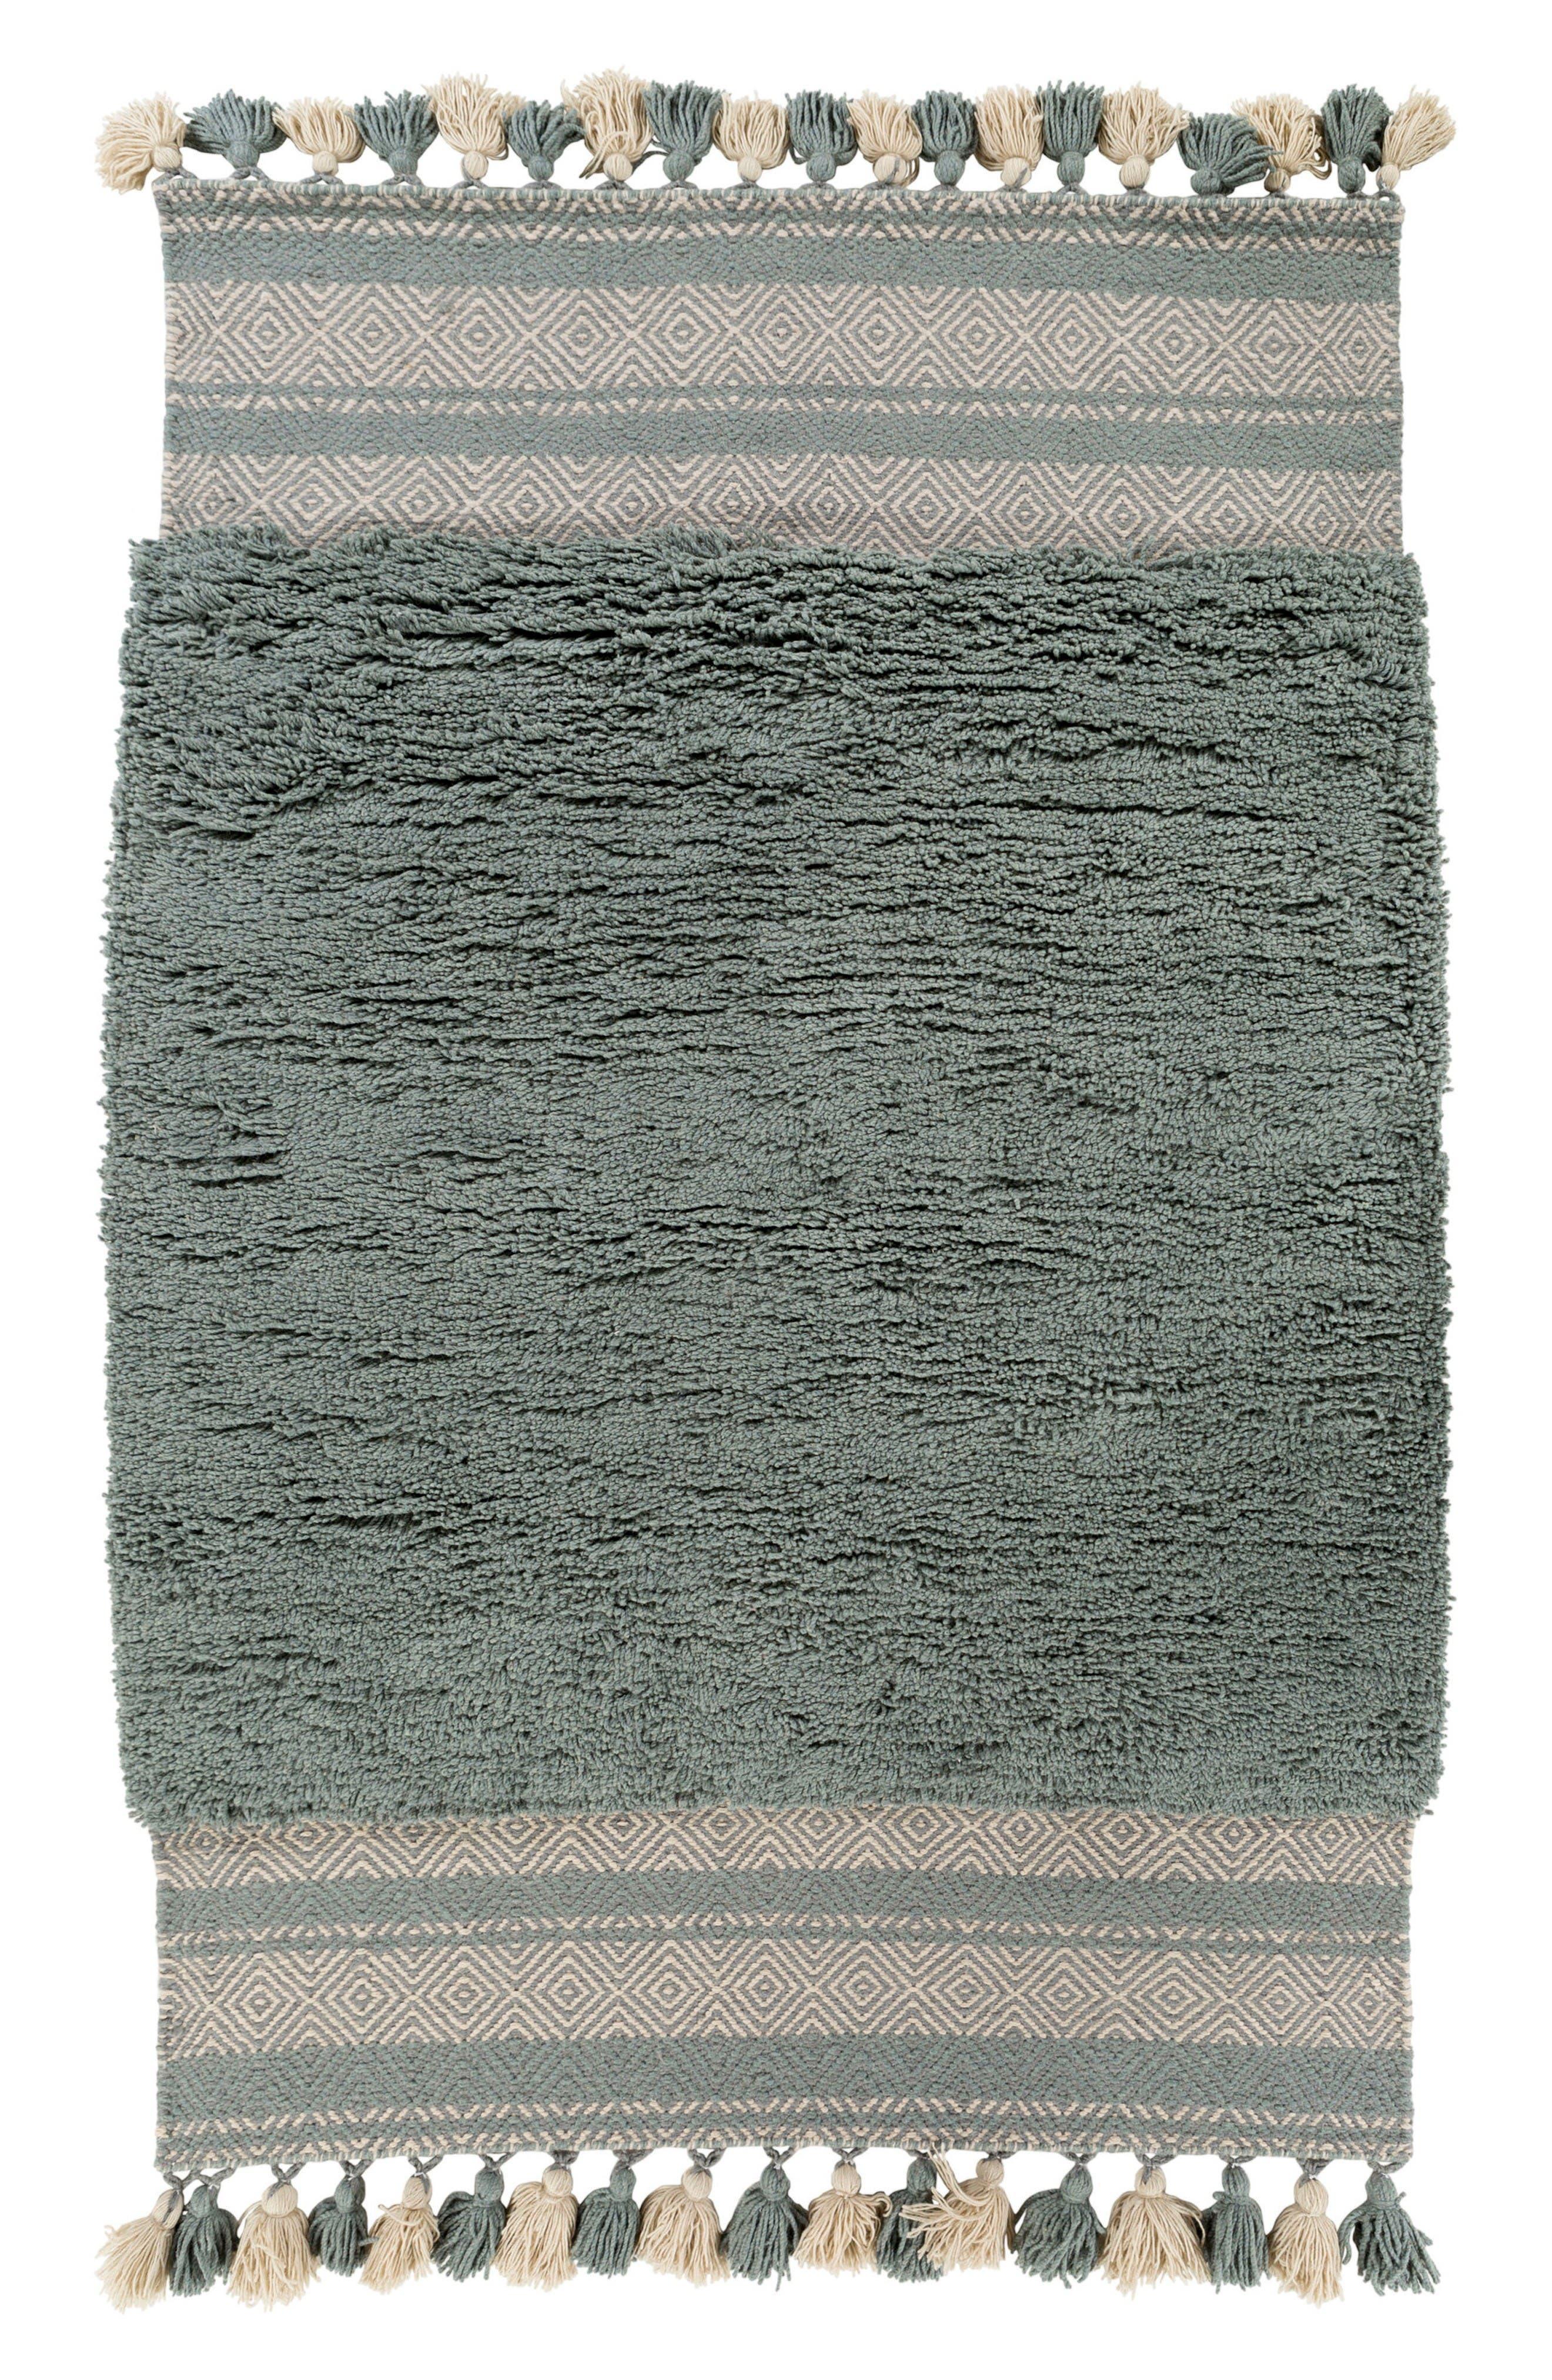 Korva Modern Handwoven Rug,                             Main thumbnail 1, color,                             Teal